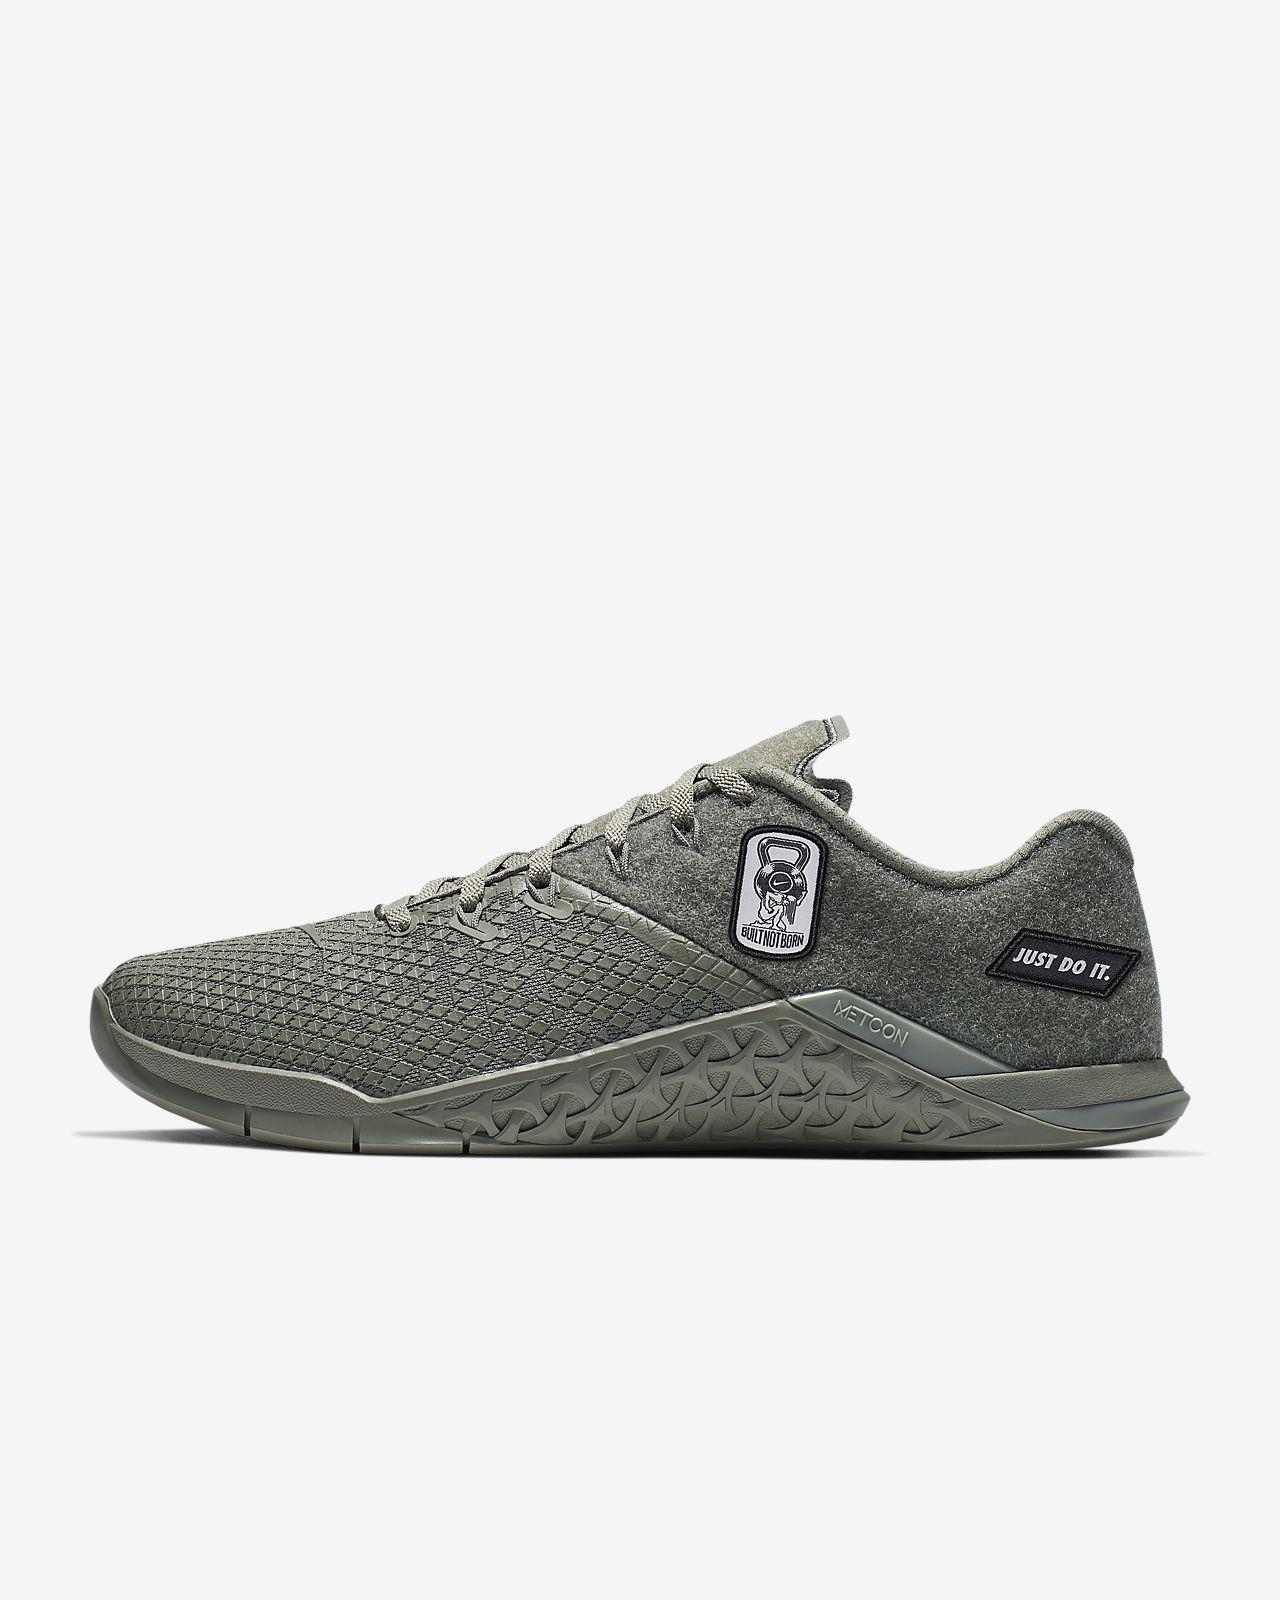 Chaussure de training Nike Metcon 4 XD Patch pour Homme